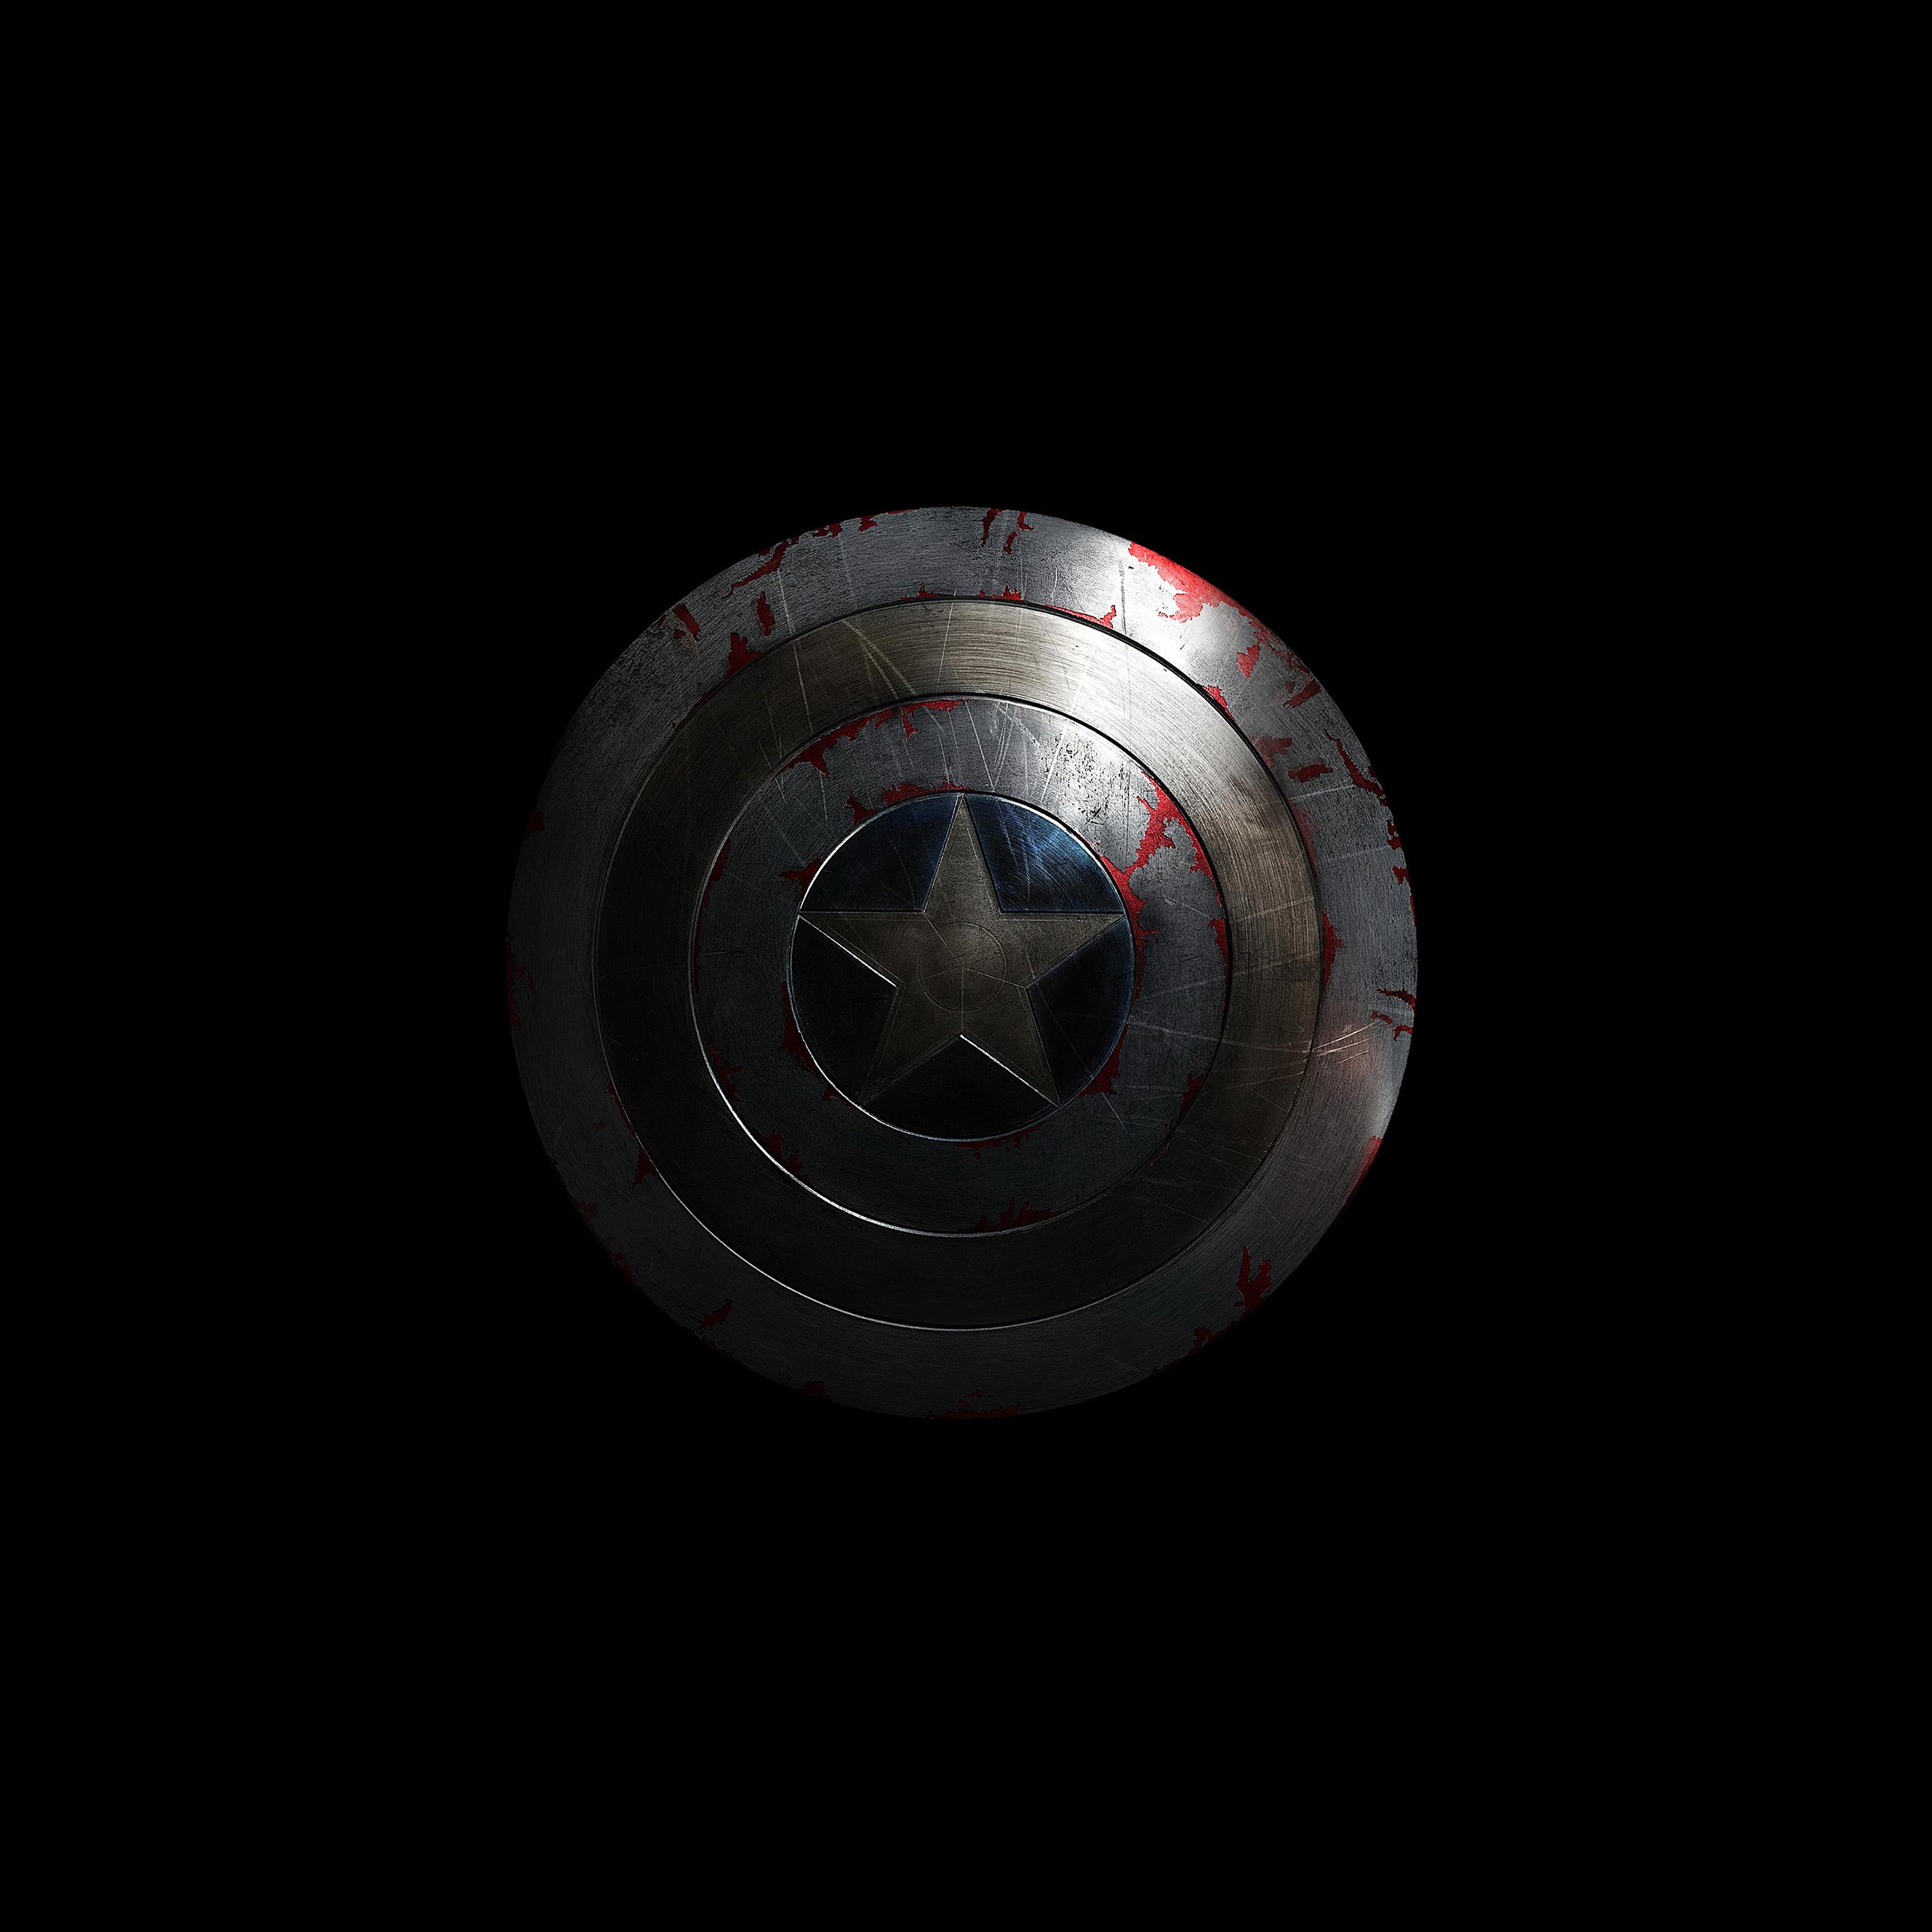 Wallpaper Iphone Superhero: Al85-captain-america-avengers-hero-sheild-small-dark-wallpaper